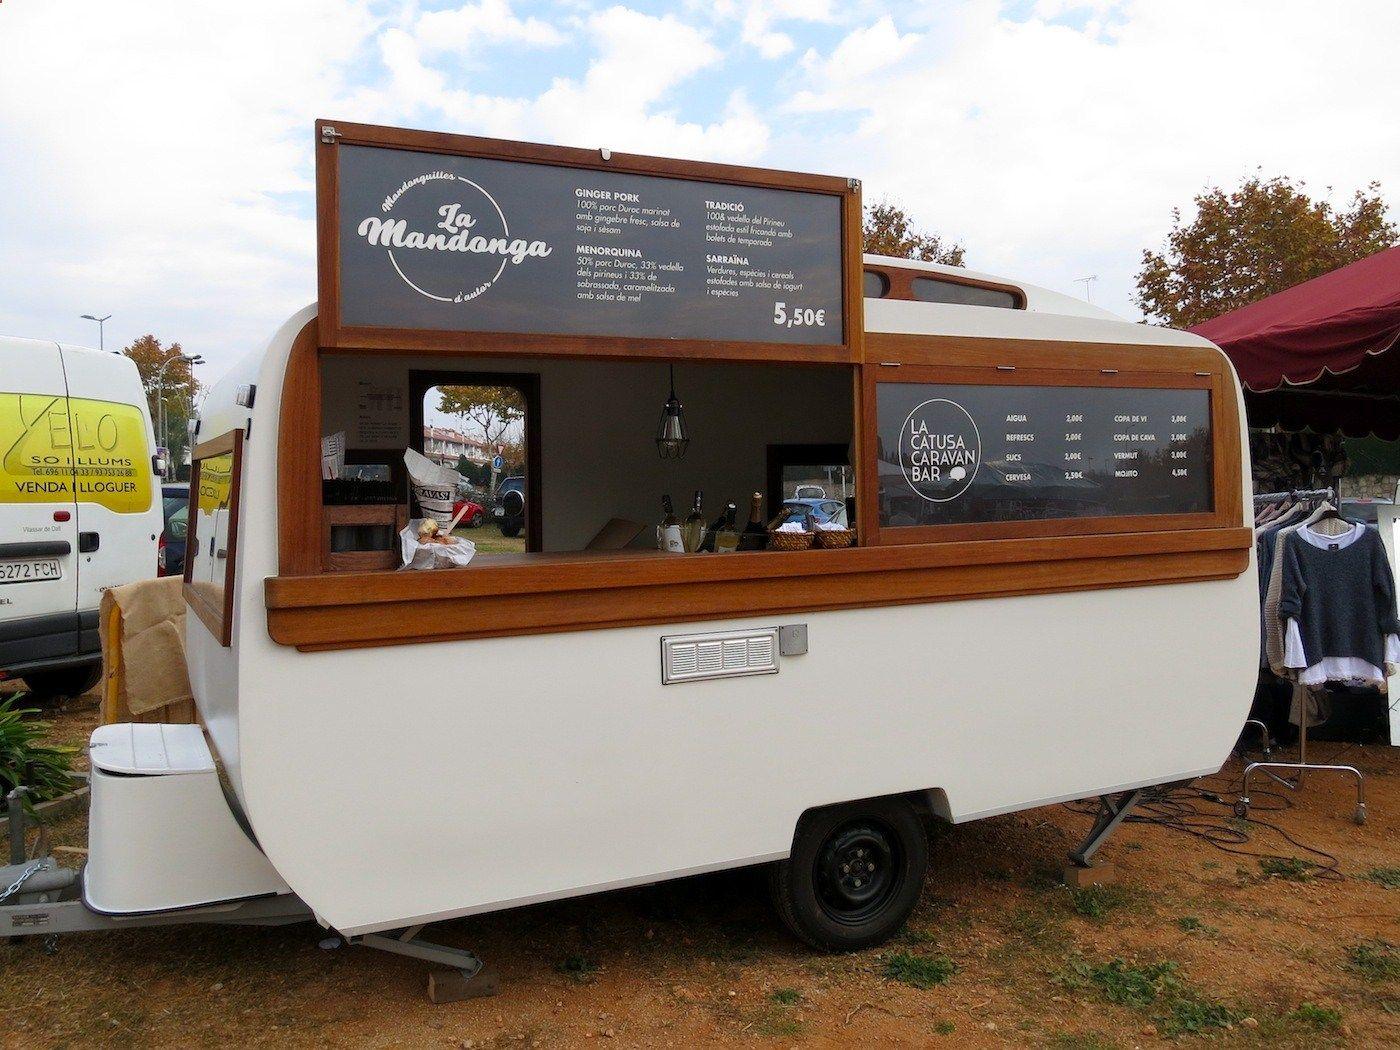 La catusa caravan bar food truck experience